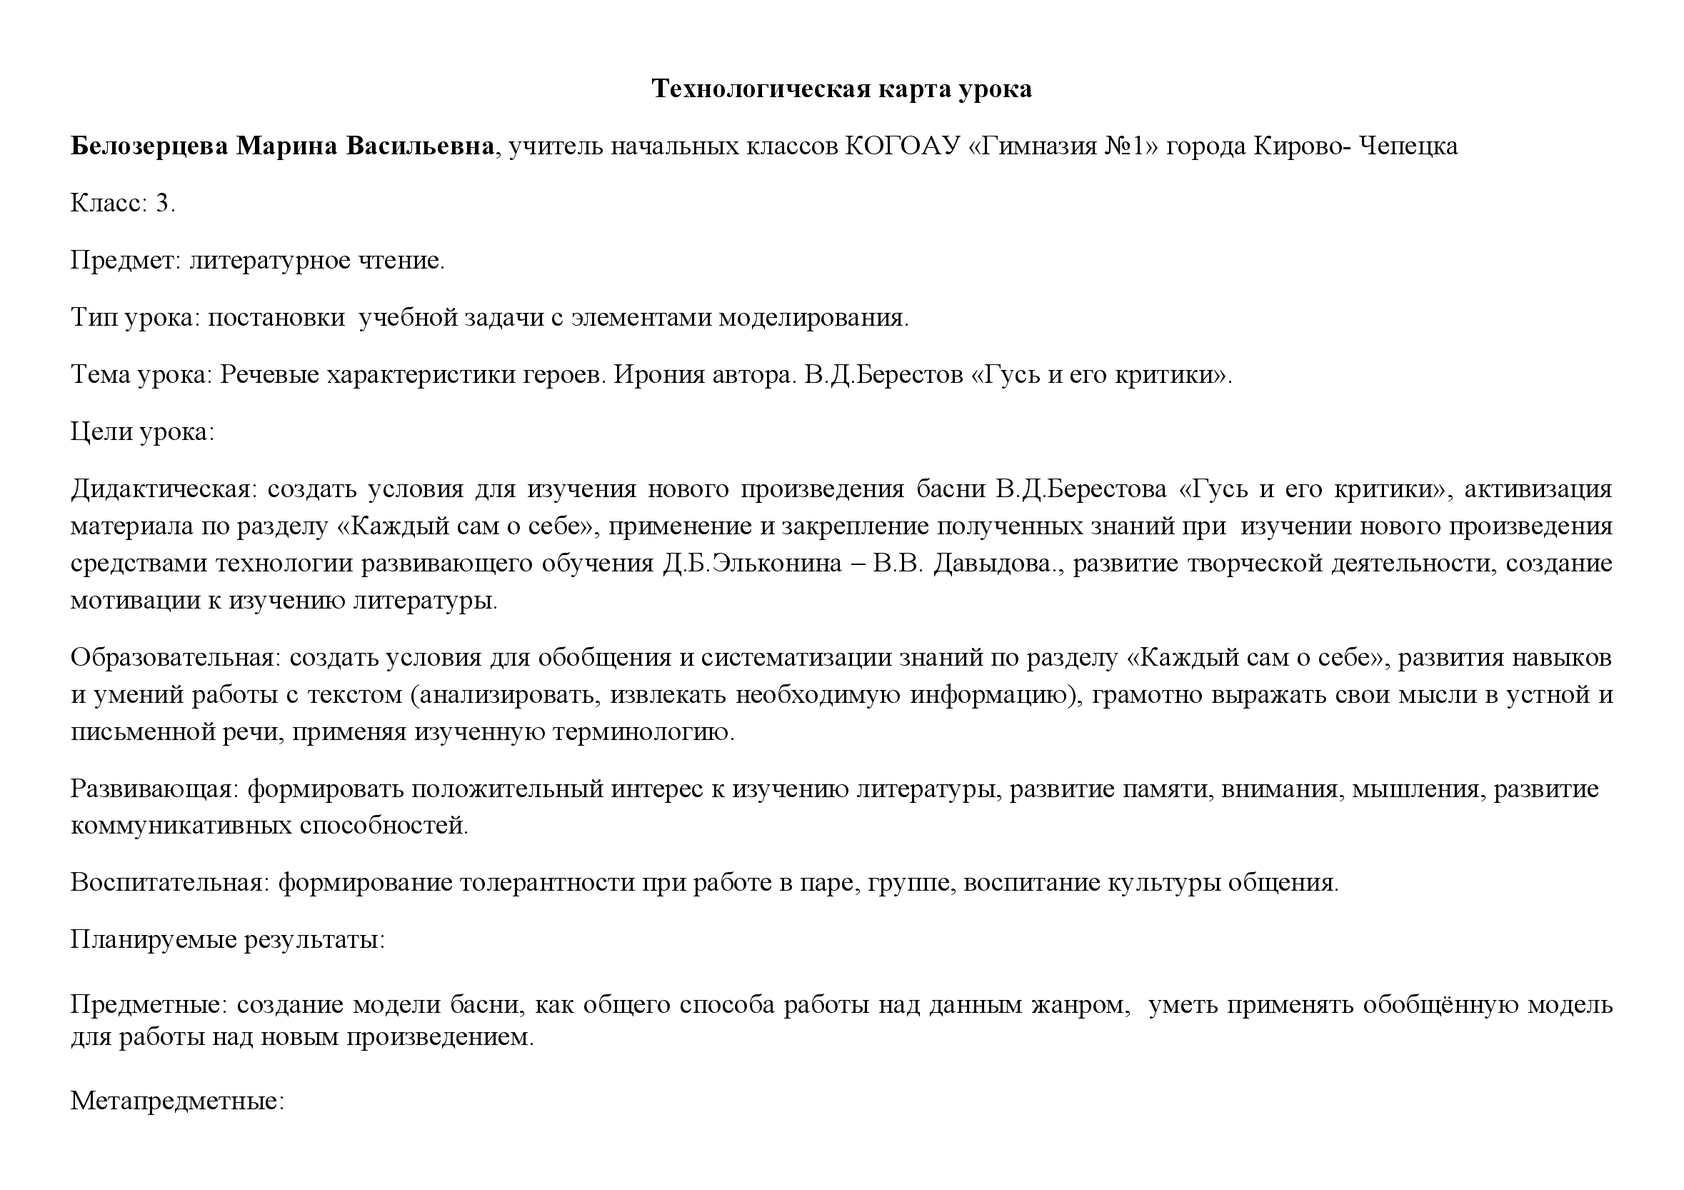 3 класс модели текста работа над текстом работа в вебчате южно сахалинск